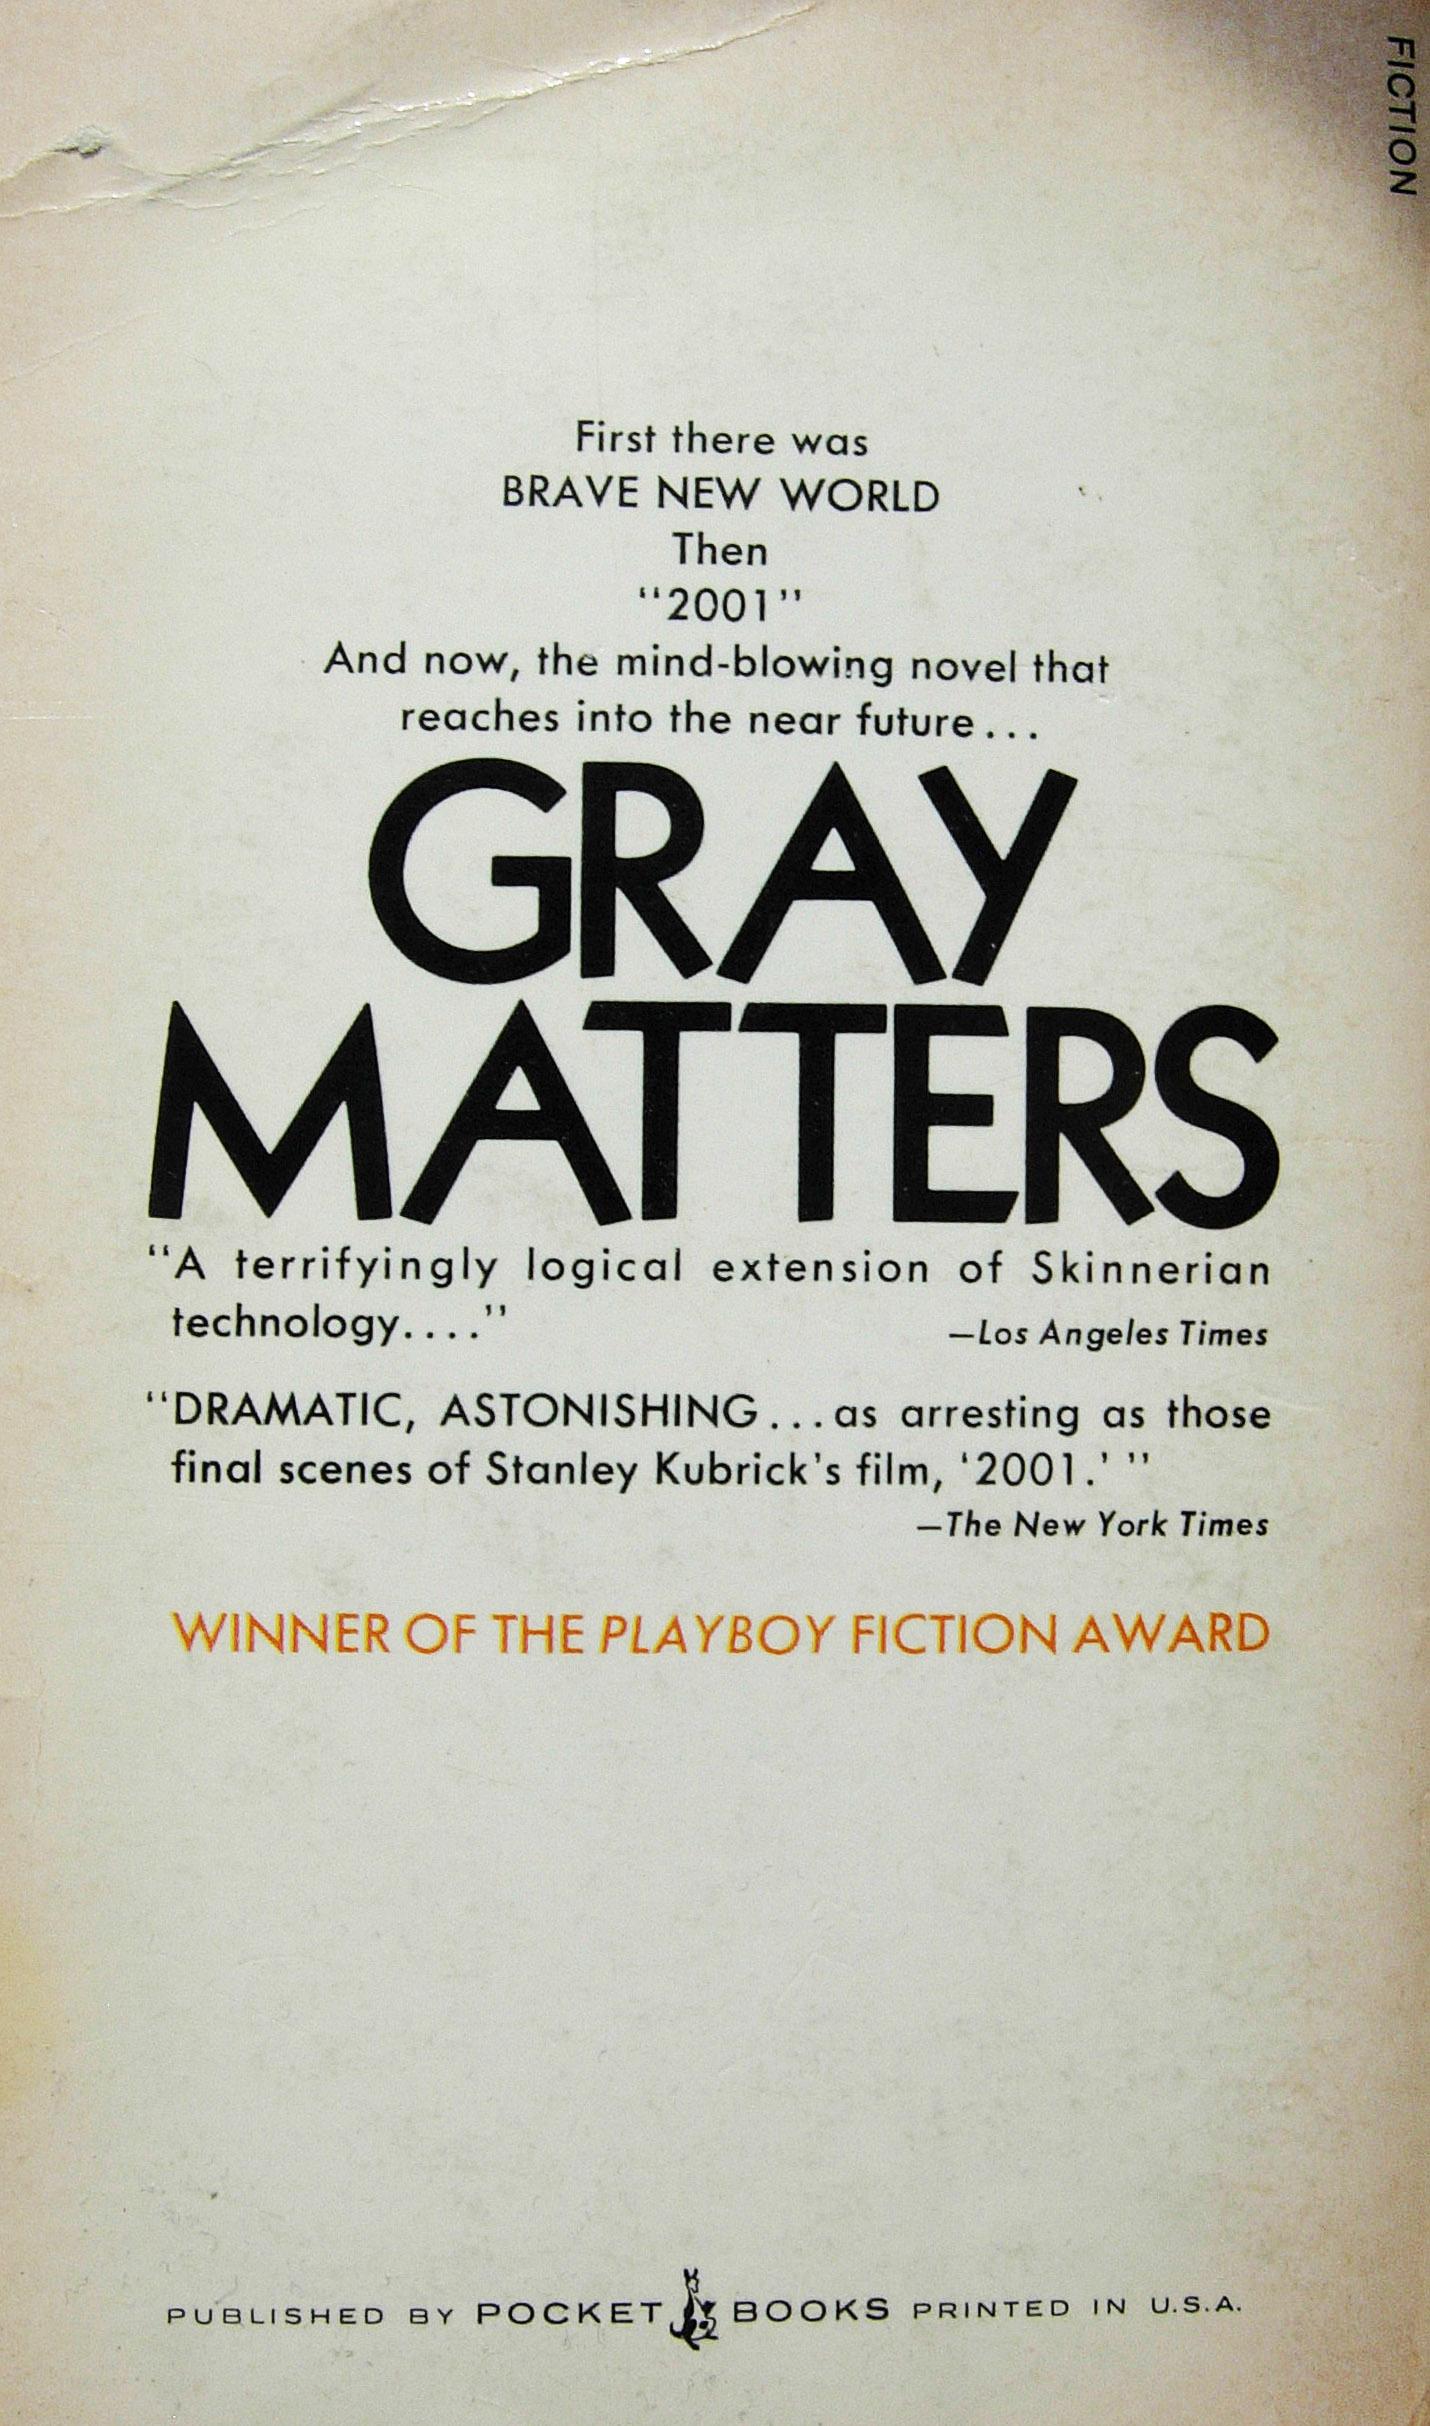 Paperback, Pocket Books 1972